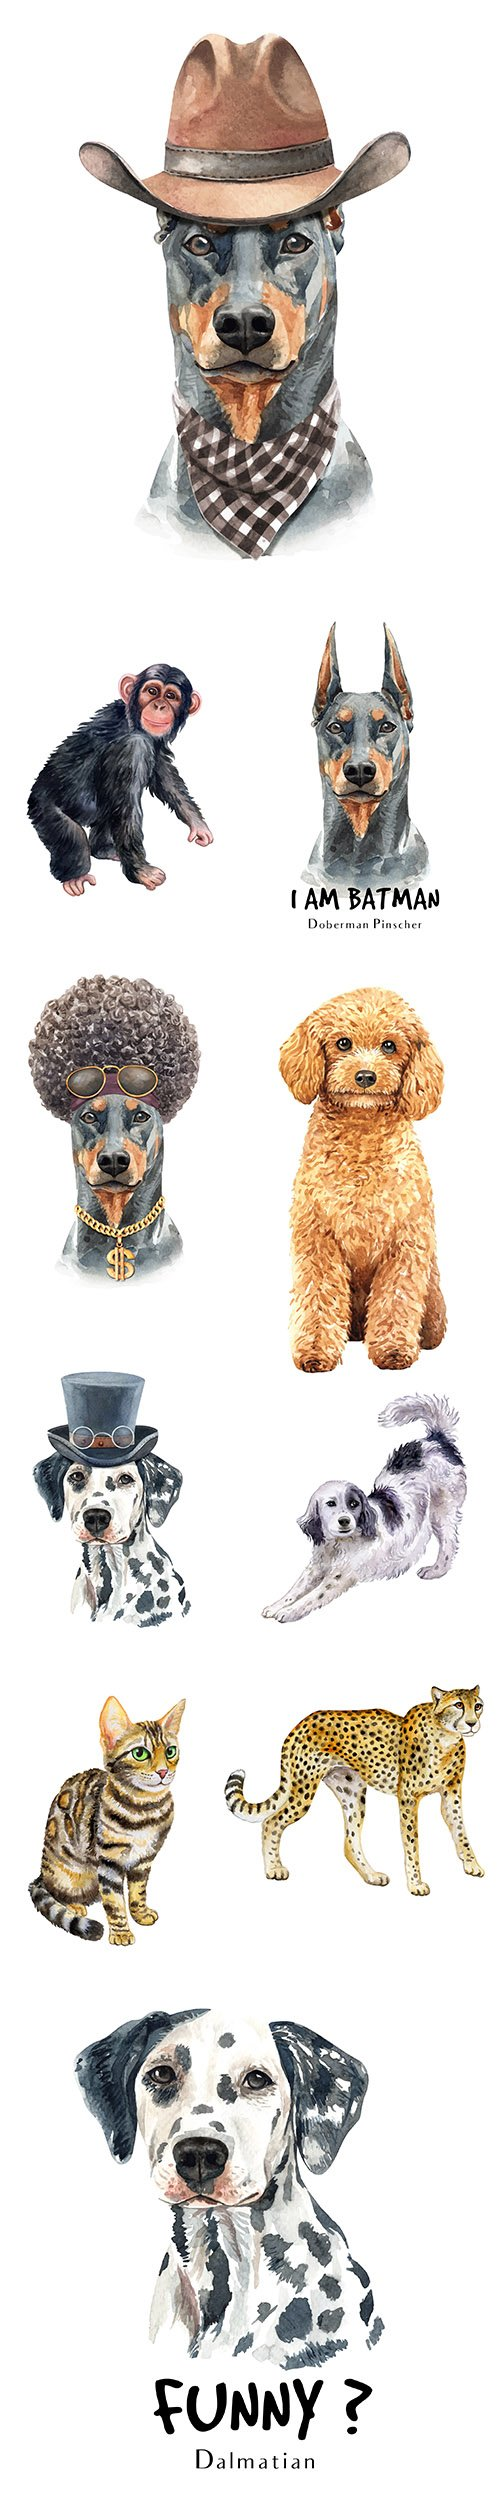 Watercolor Printing Animals Vol2